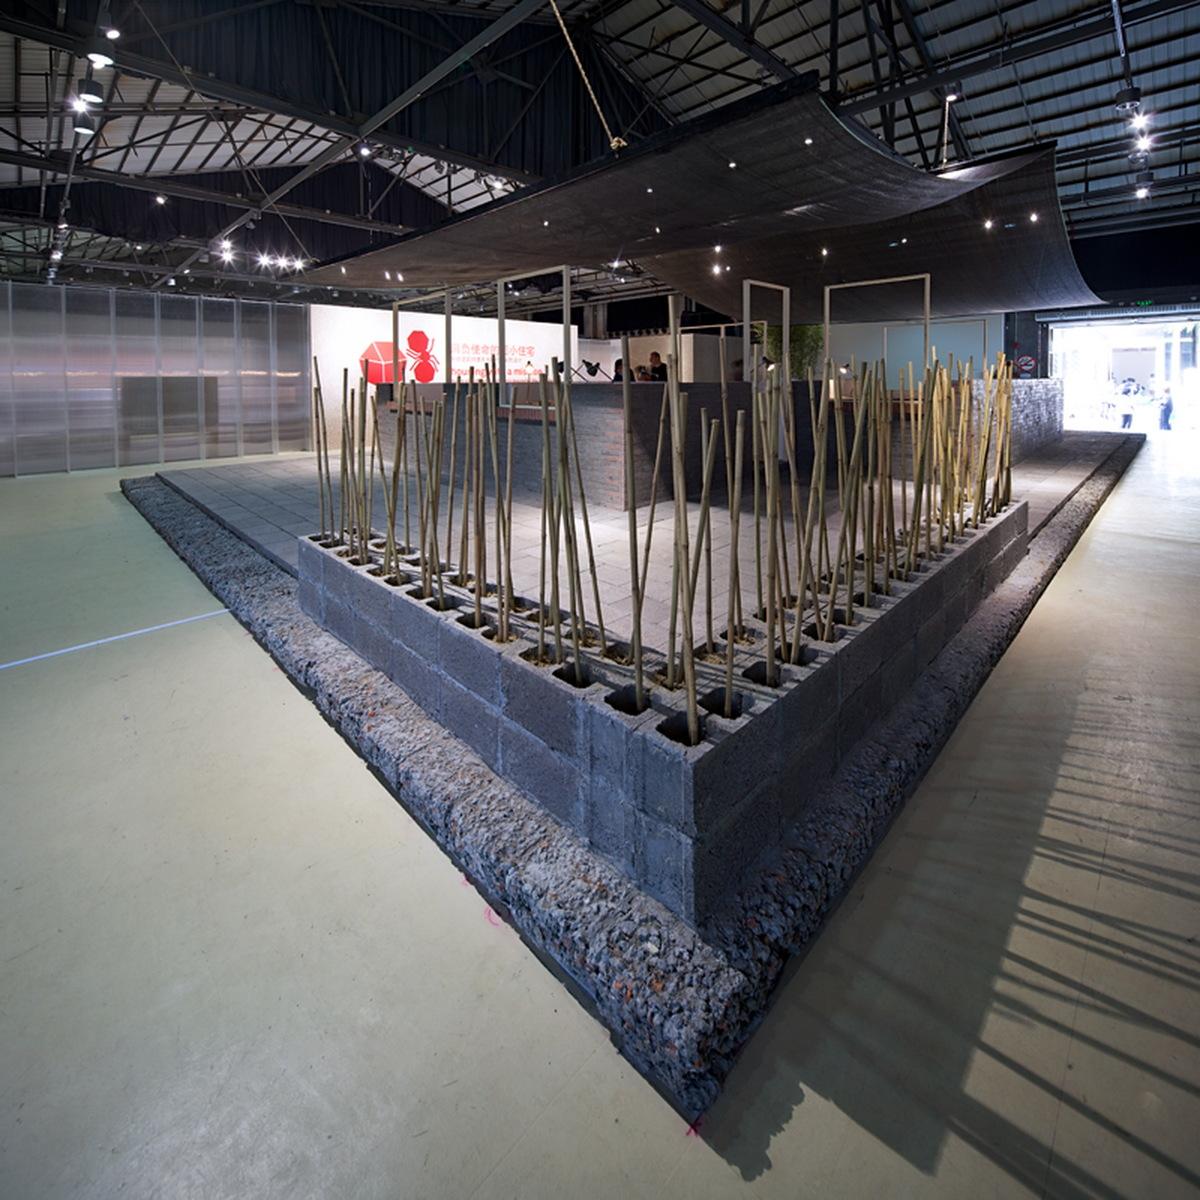 Rebirth brick, Jiakun LAU, image courtesy of UABB.